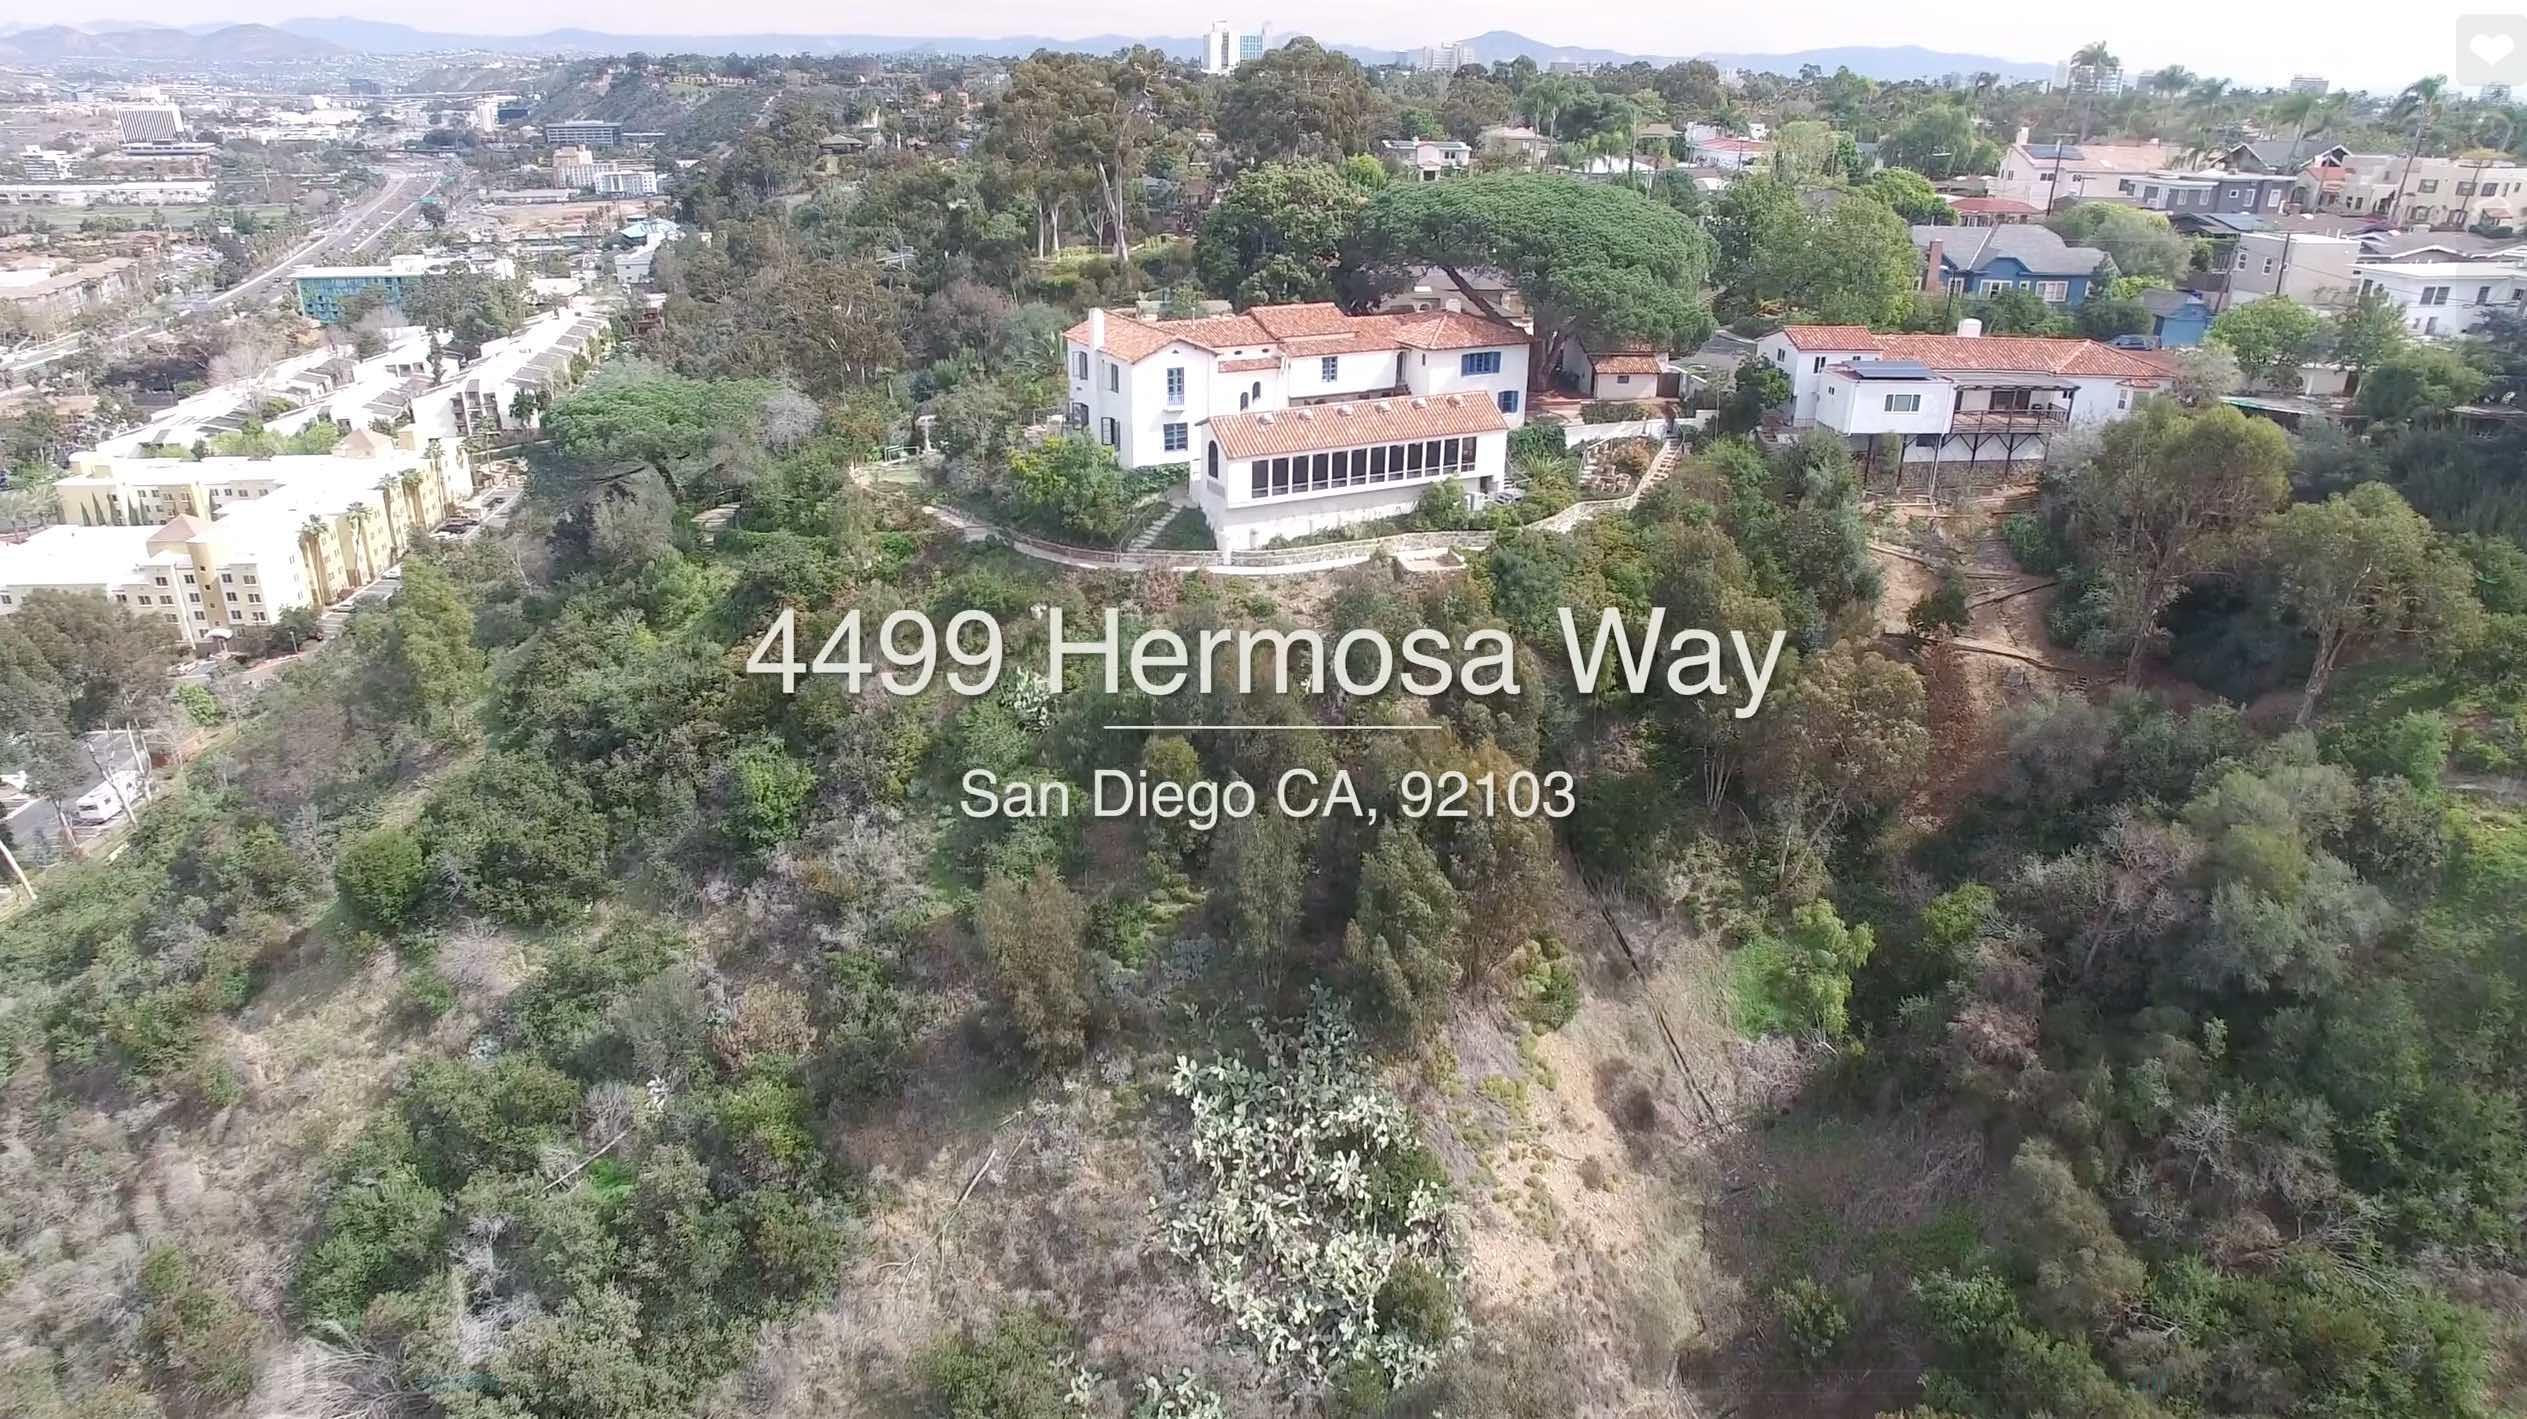 Villa-Hermosa-Aerial-1